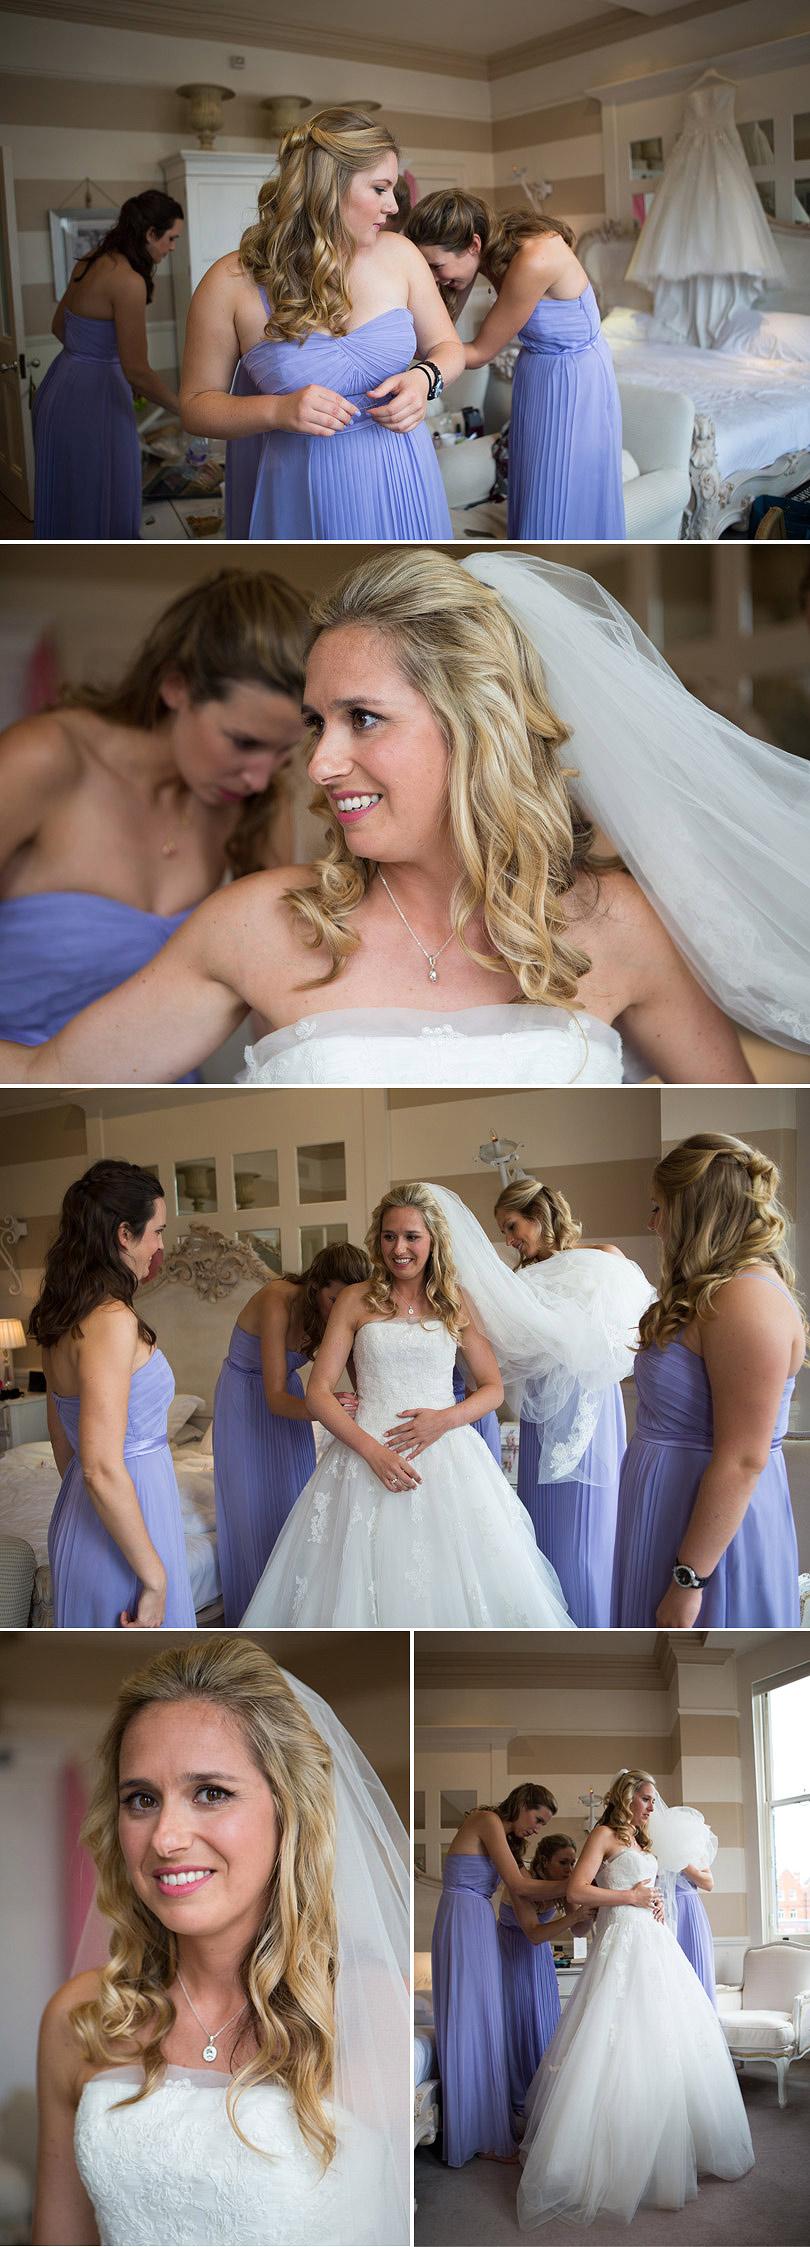 Brompton-Oratory-Lincolns-Inn-Wedding-RachelMax-006.jpg